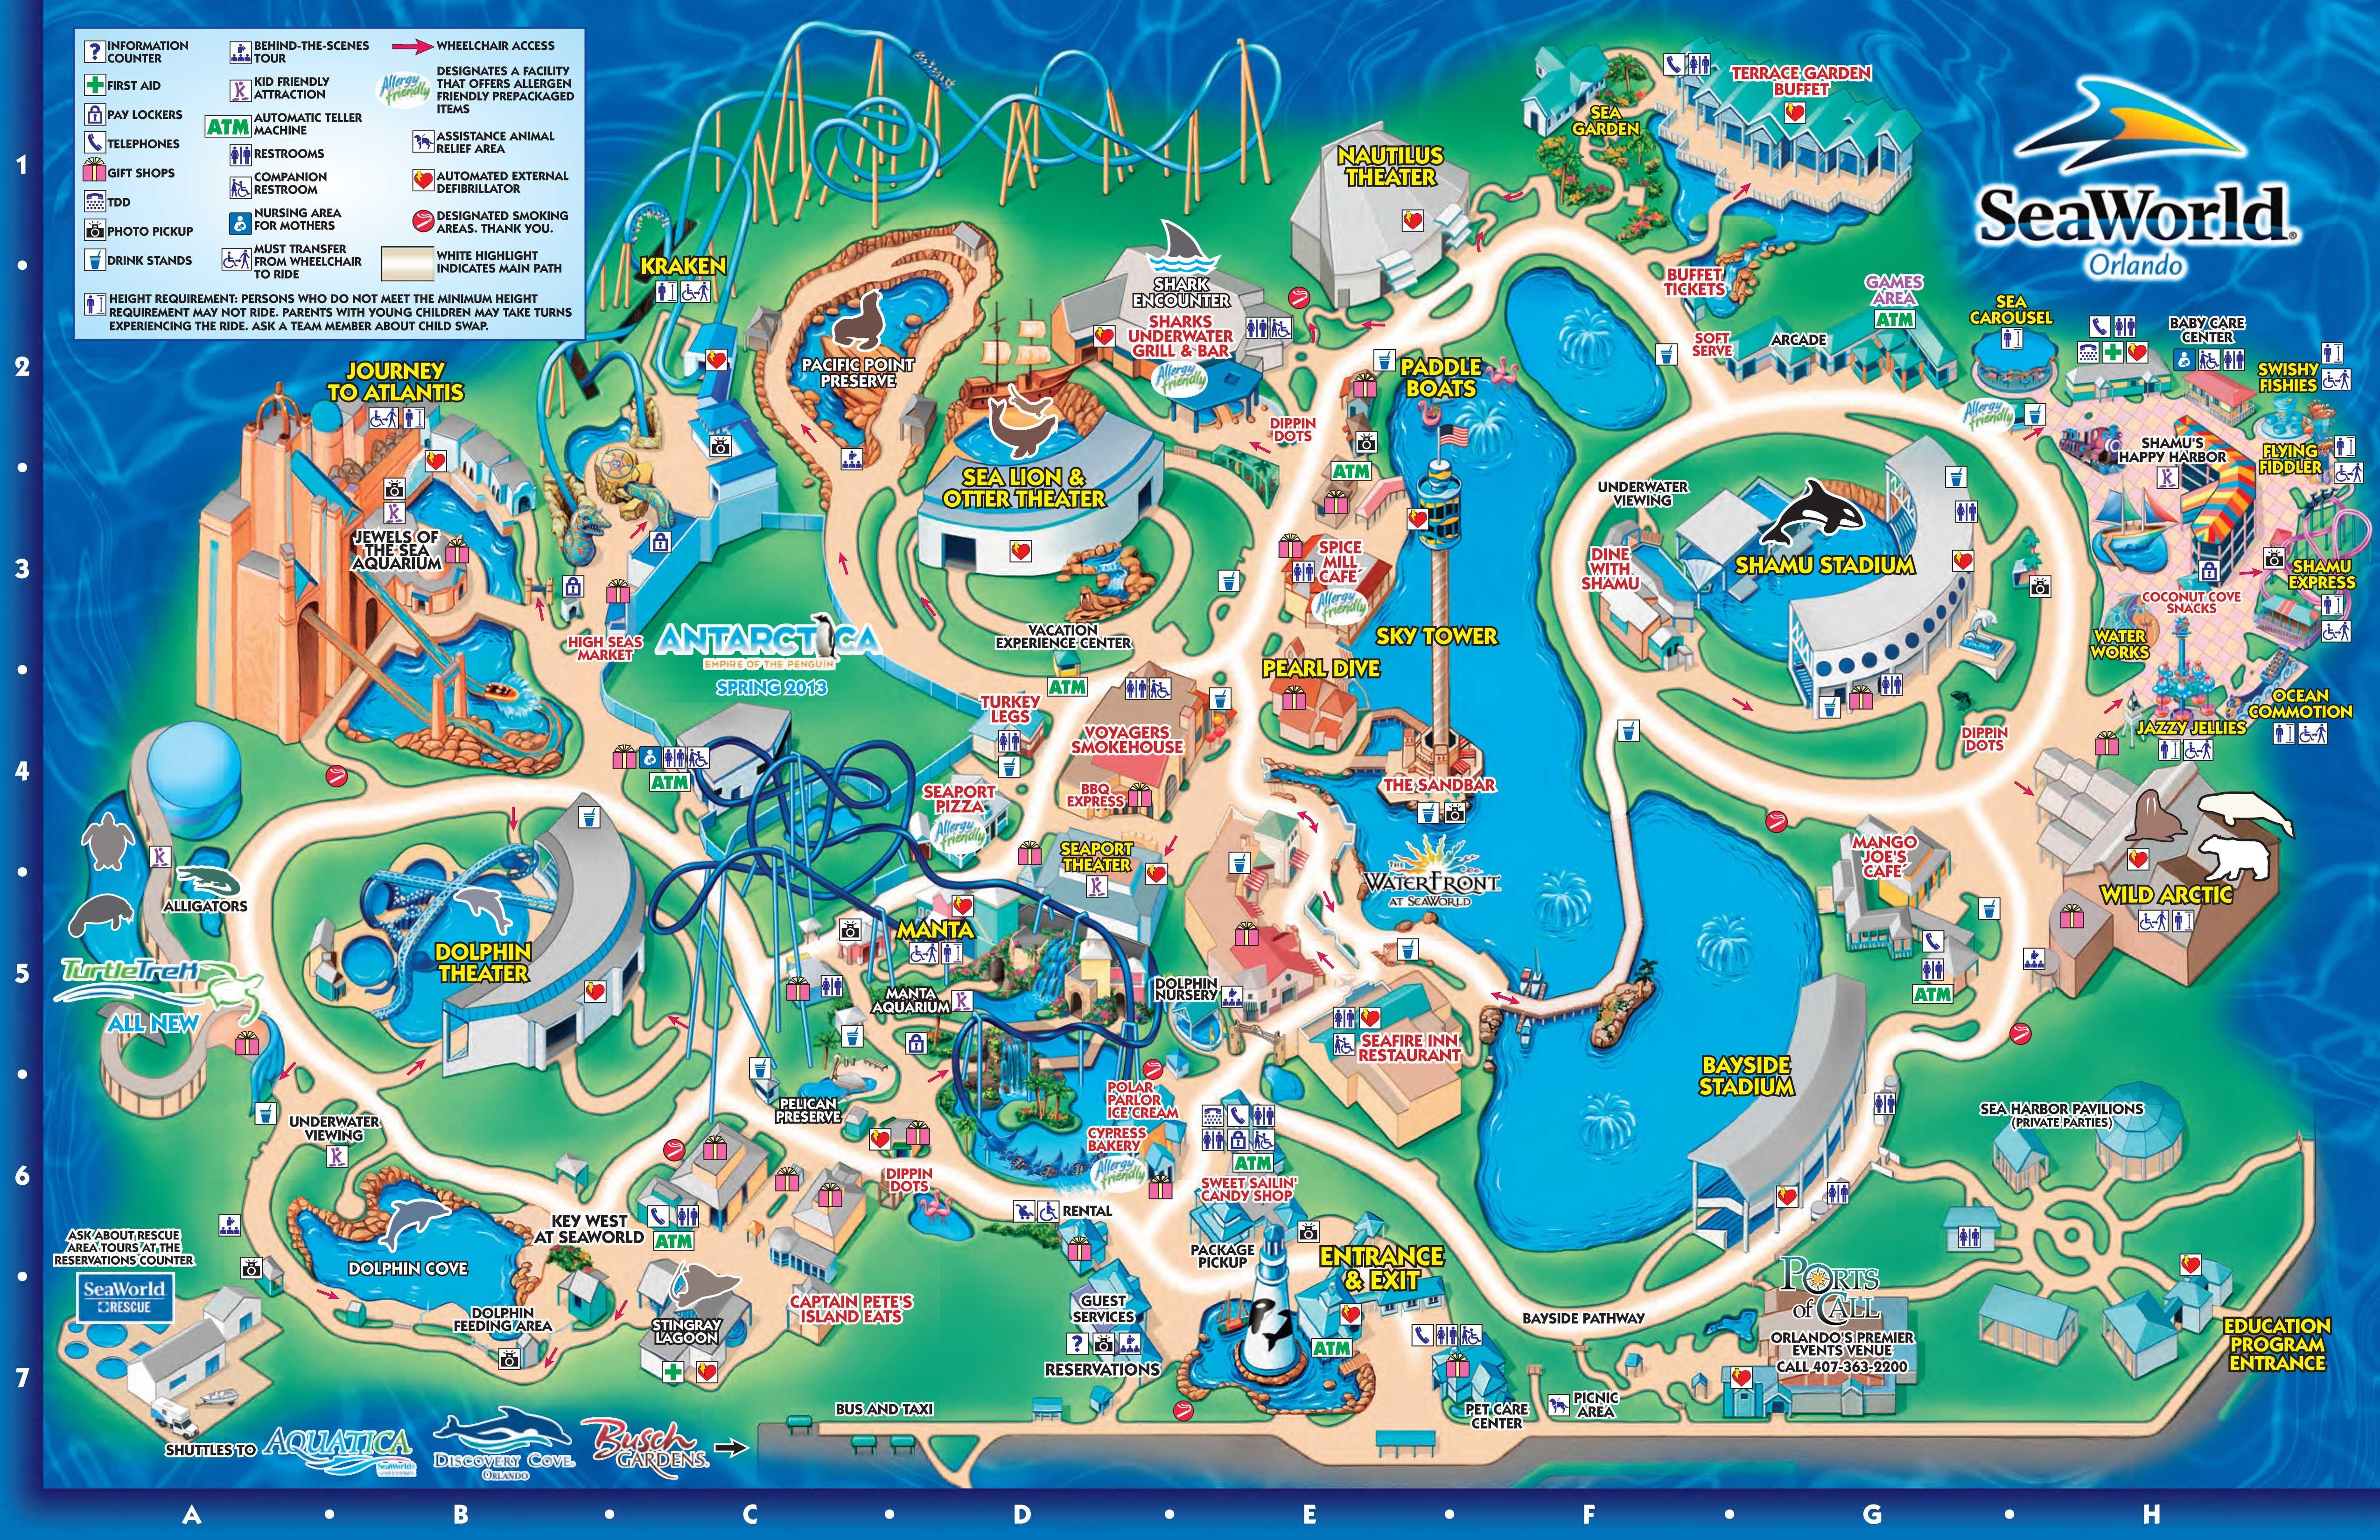 Seaworld Orlando Theme Park Map - Orlando Fl • Mappery | Aquariums - Sea World Florida Map